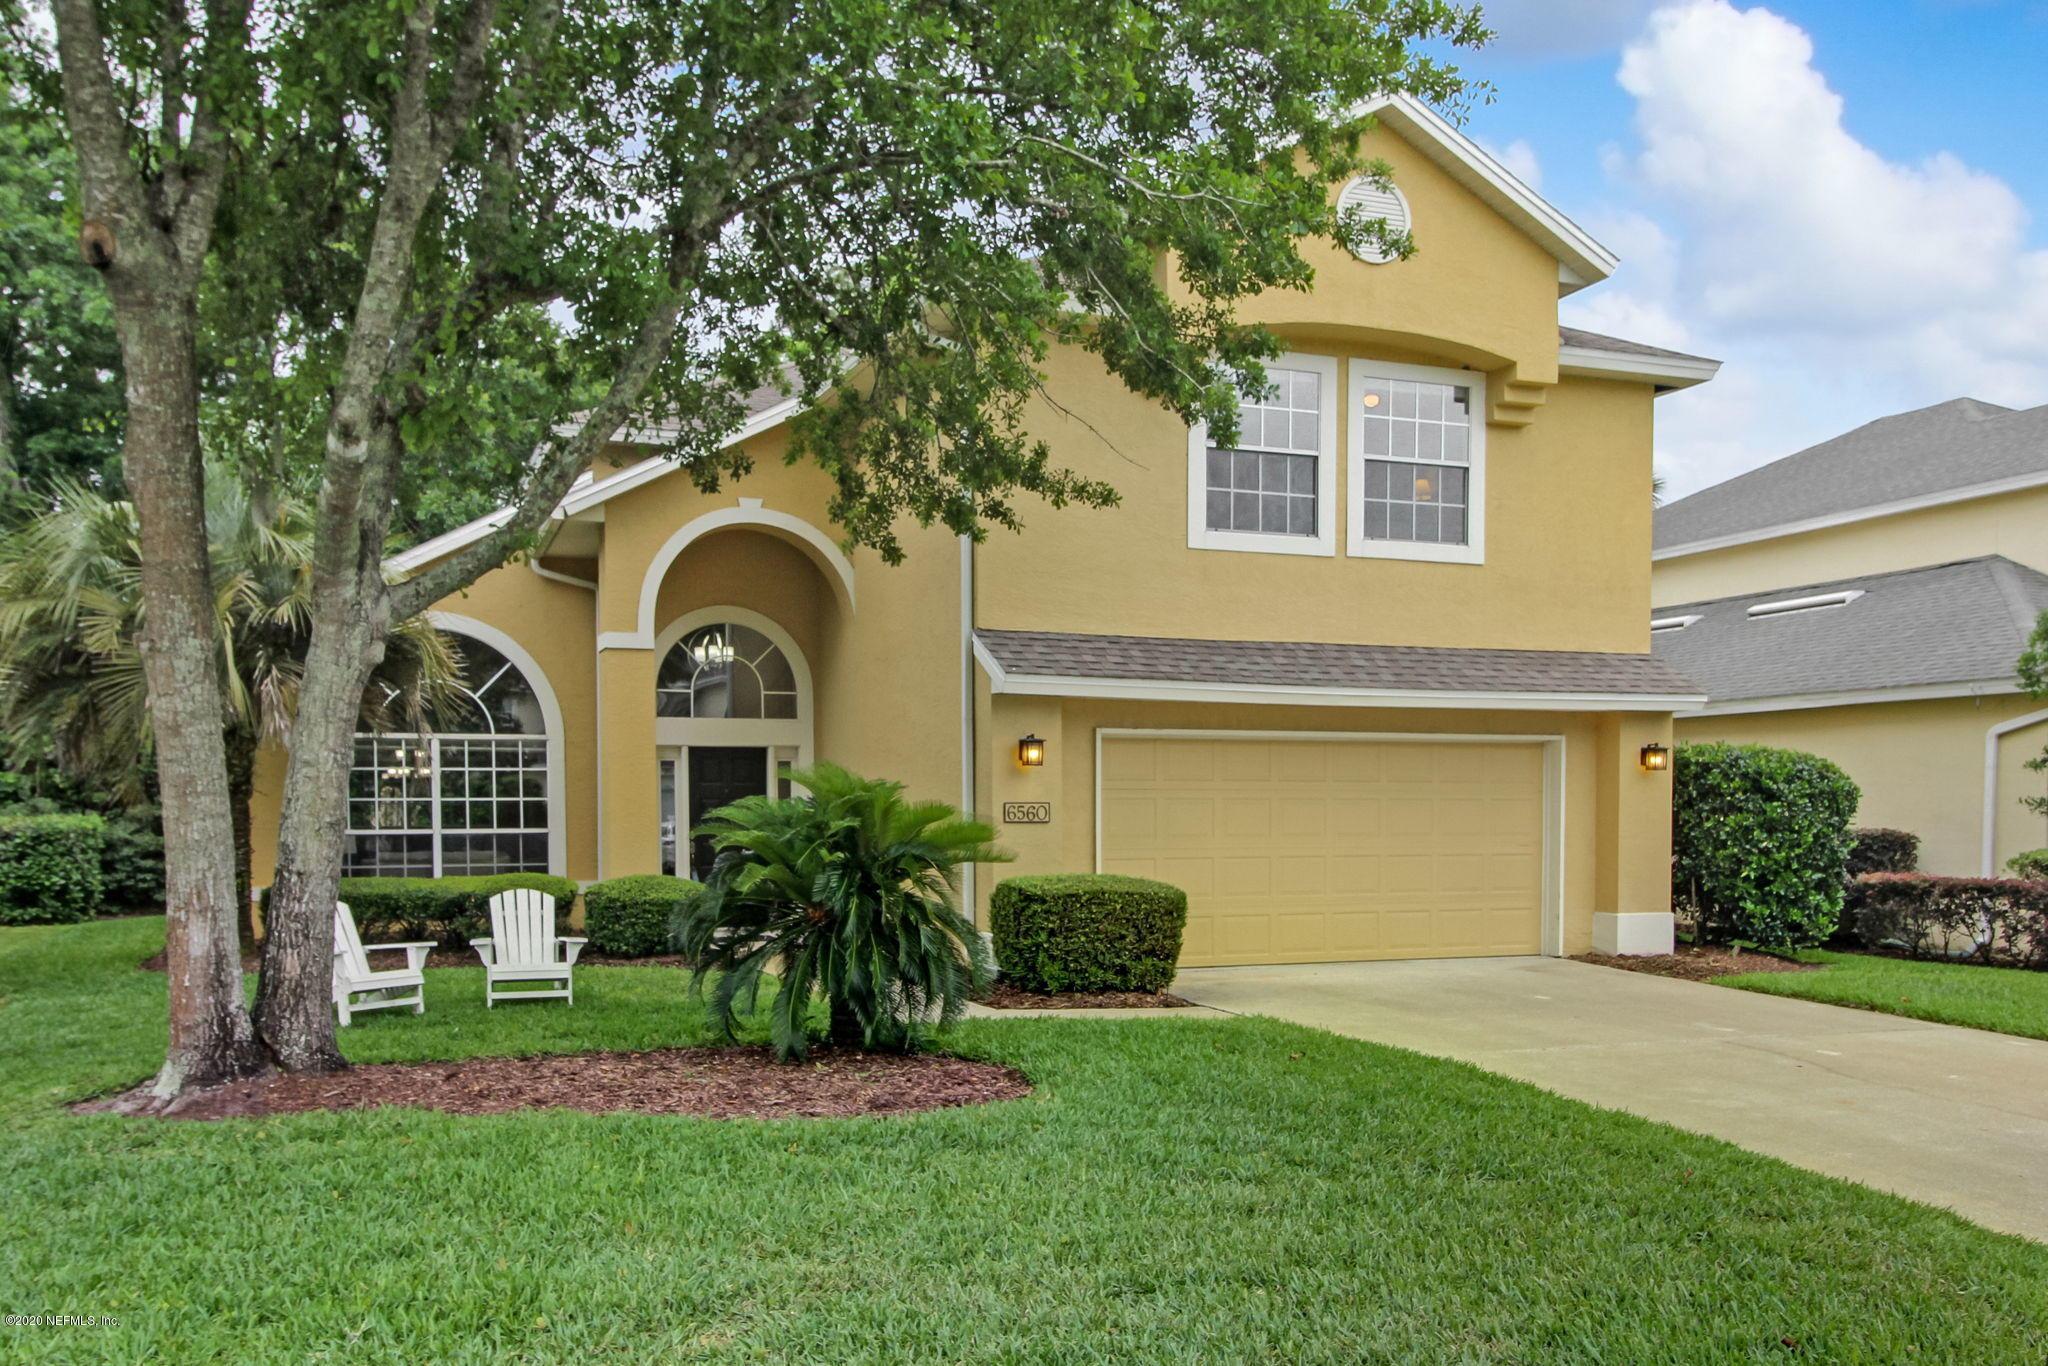 6560 COMMODORE, PONTE VEDRA BEACH, FLORIDA 32082, 4 Bedrooms Bedrooms, ,2 BathroomsBathrooms,Residential,For sale,COMMODORE,1055468